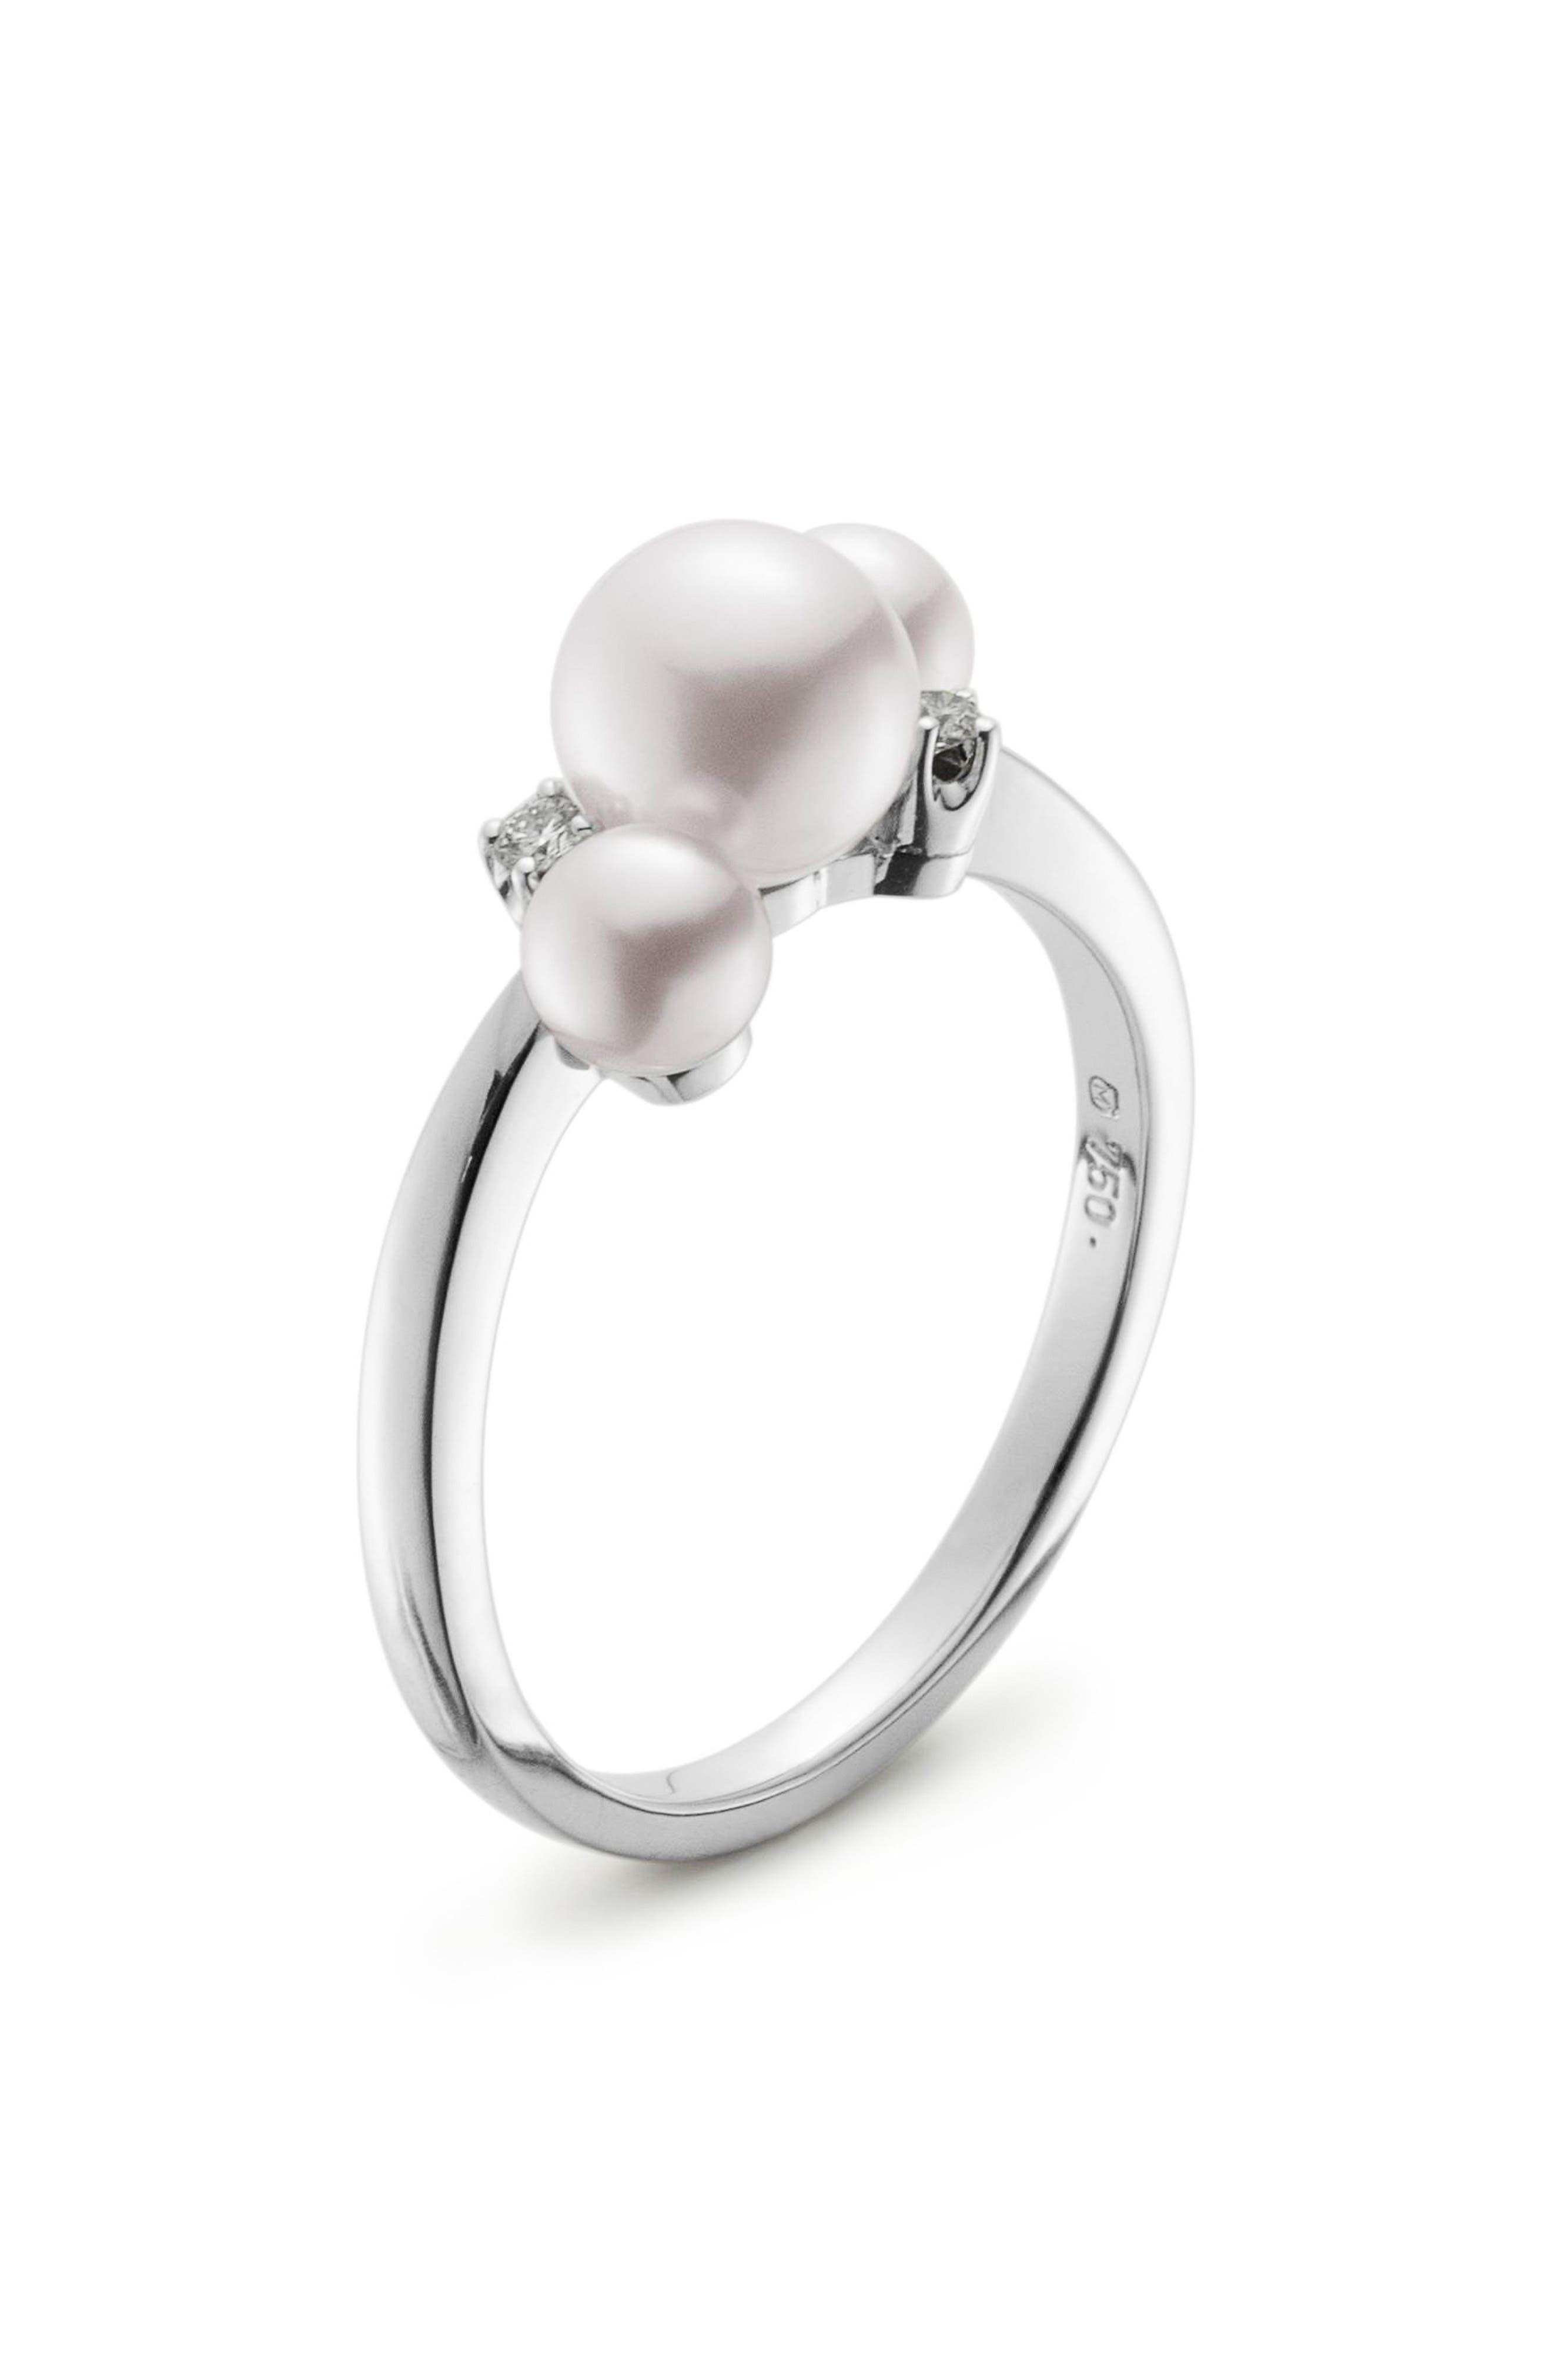 Pearl & Diamond Ring,                             Main thumbnail 1, color,                             WHITE GOLD